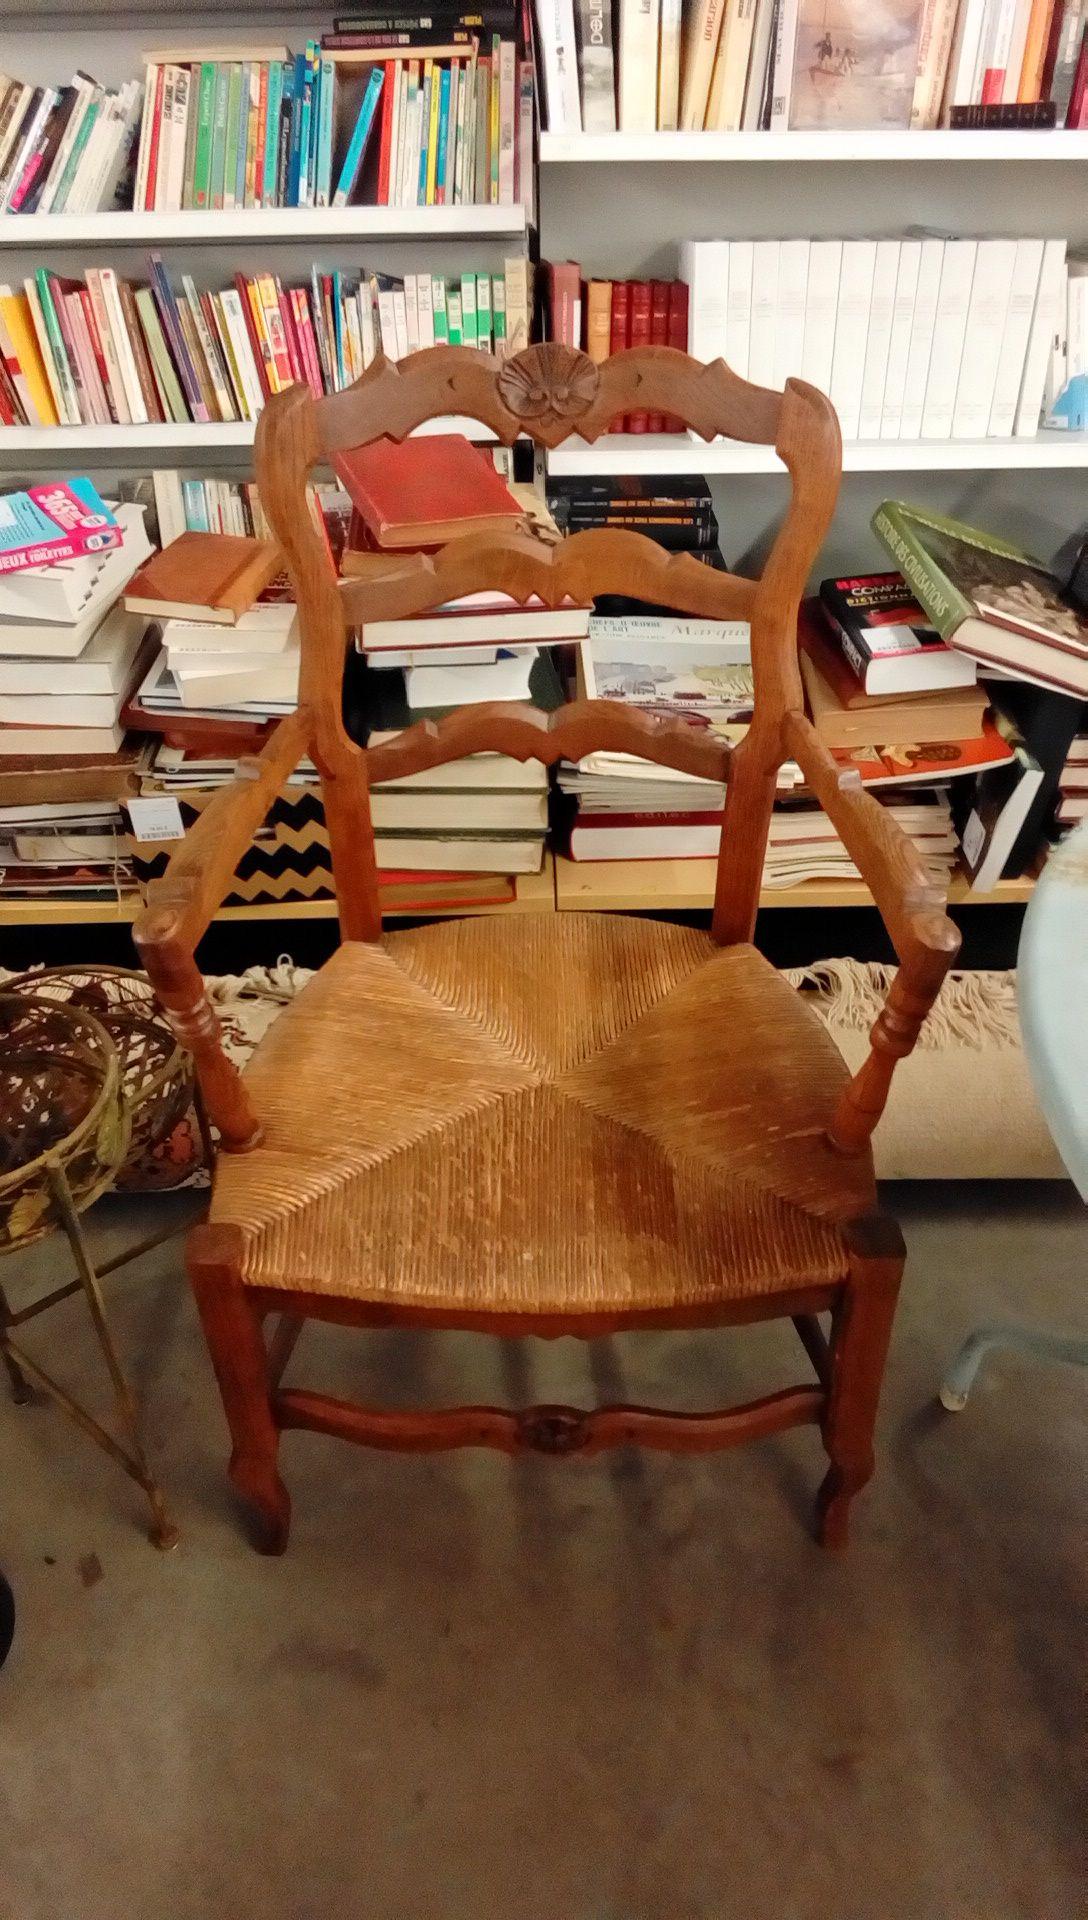 fauteuil rustique occasion troc nancy. Black Bedroom Furniture Sets. Home Design Ideas